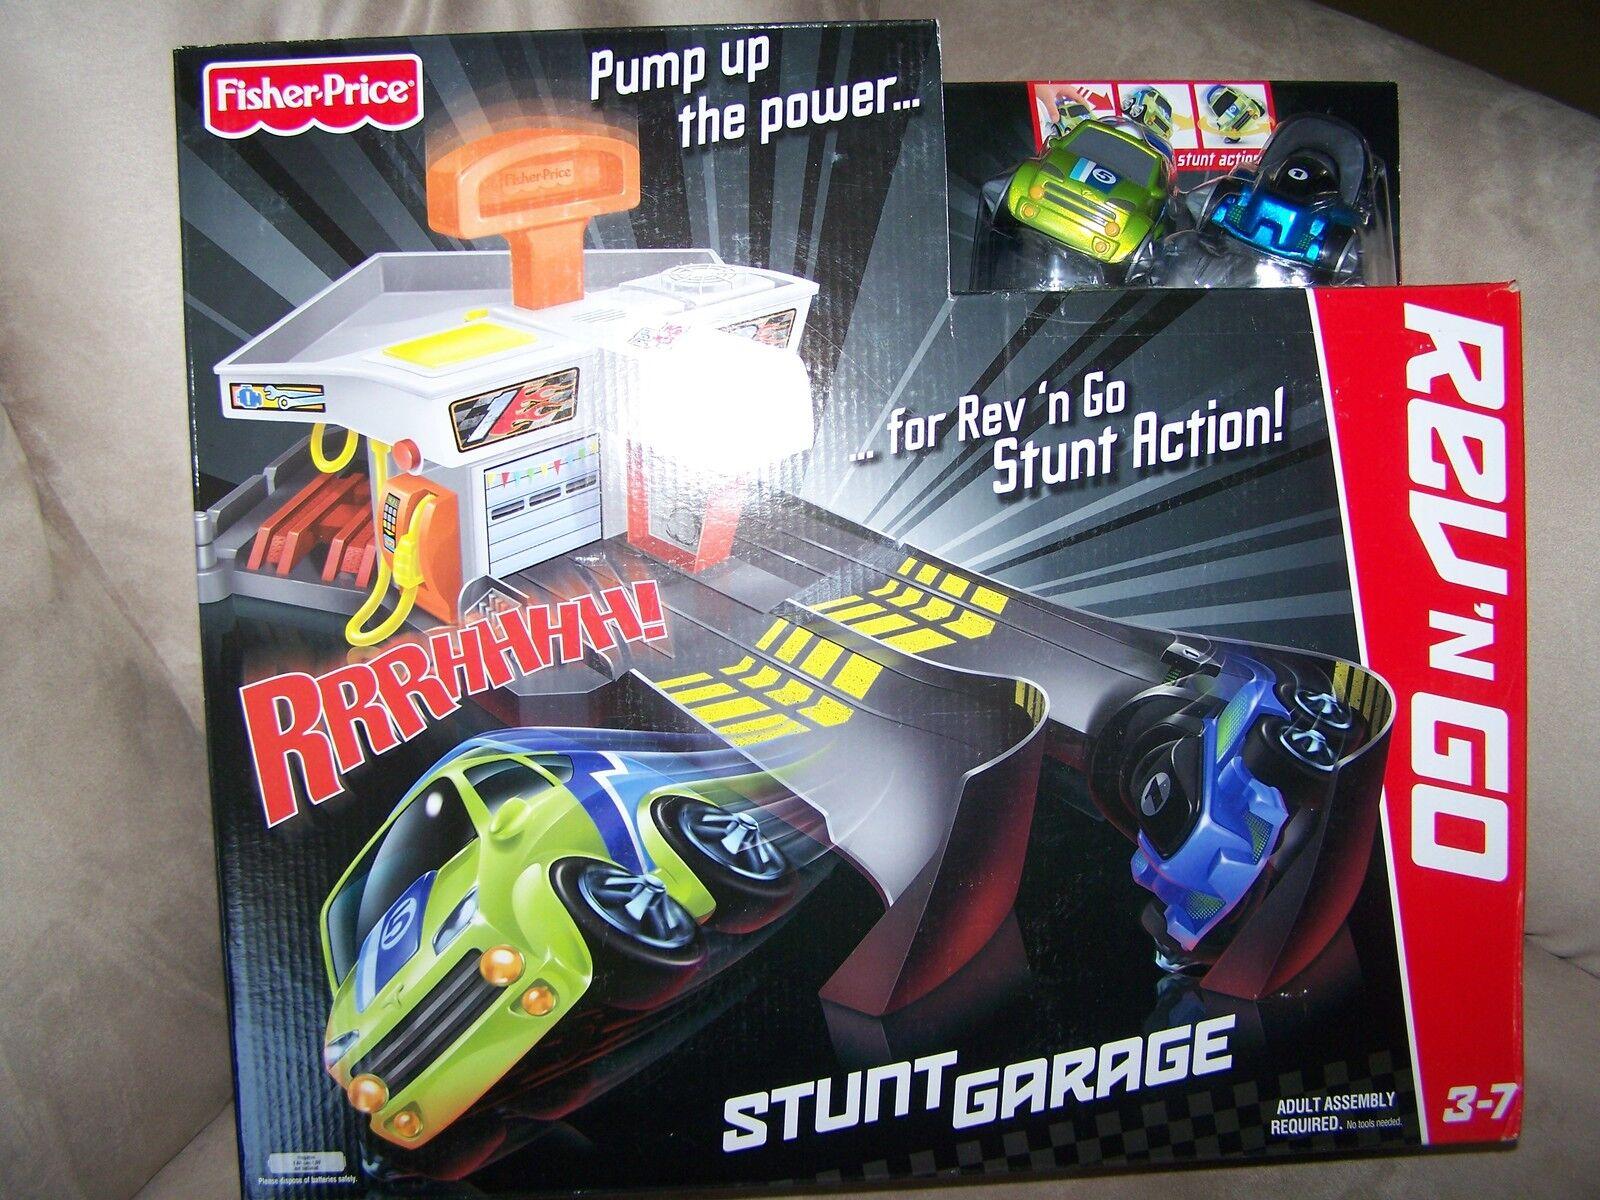 Fisher Price REV 'N GO STUNT GARAGE   Pretend play